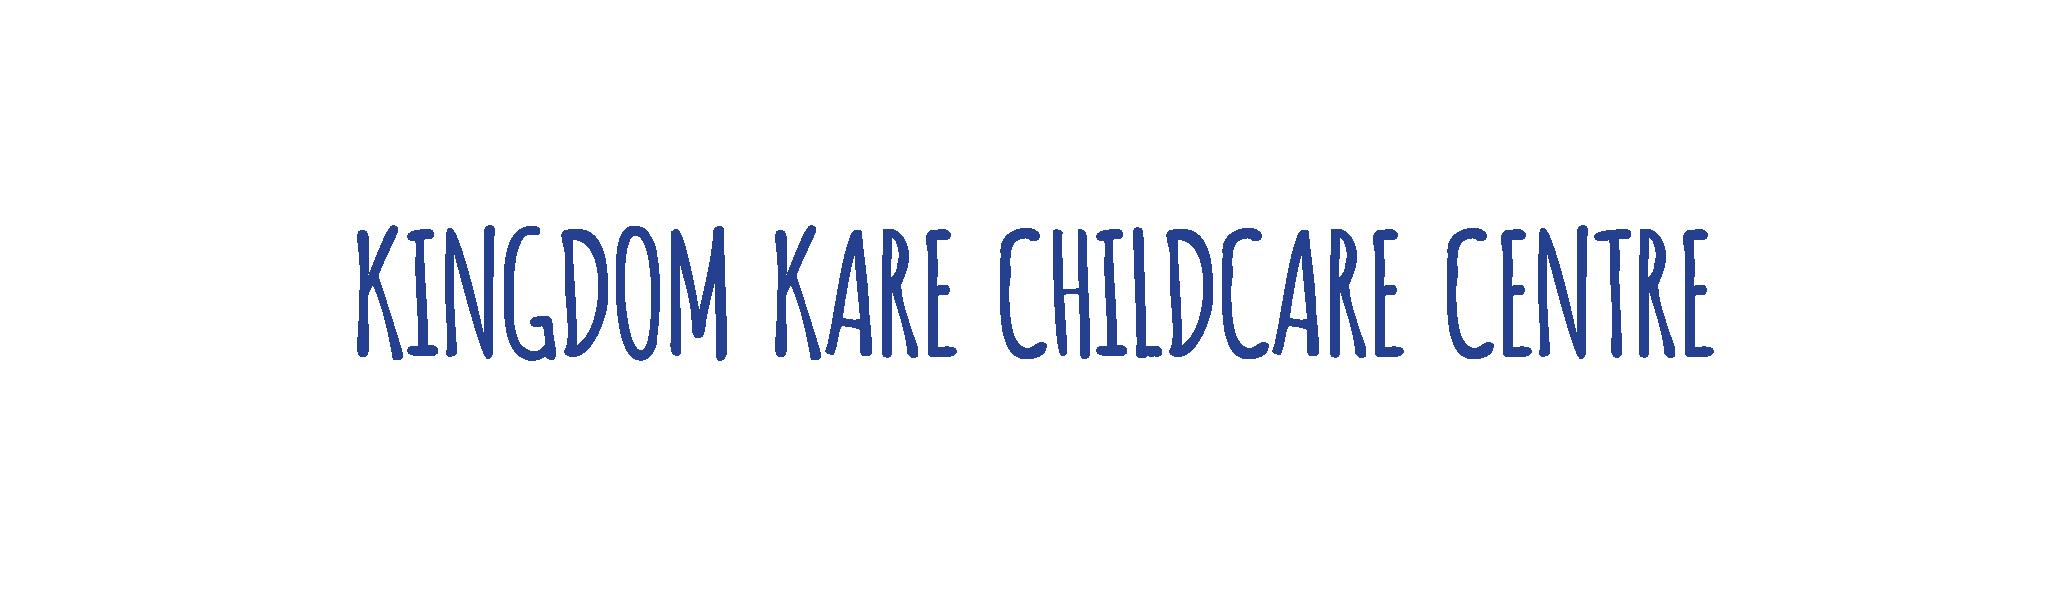 Kingdom-Kare-Childcare-Centre-Rotating-Header8.png